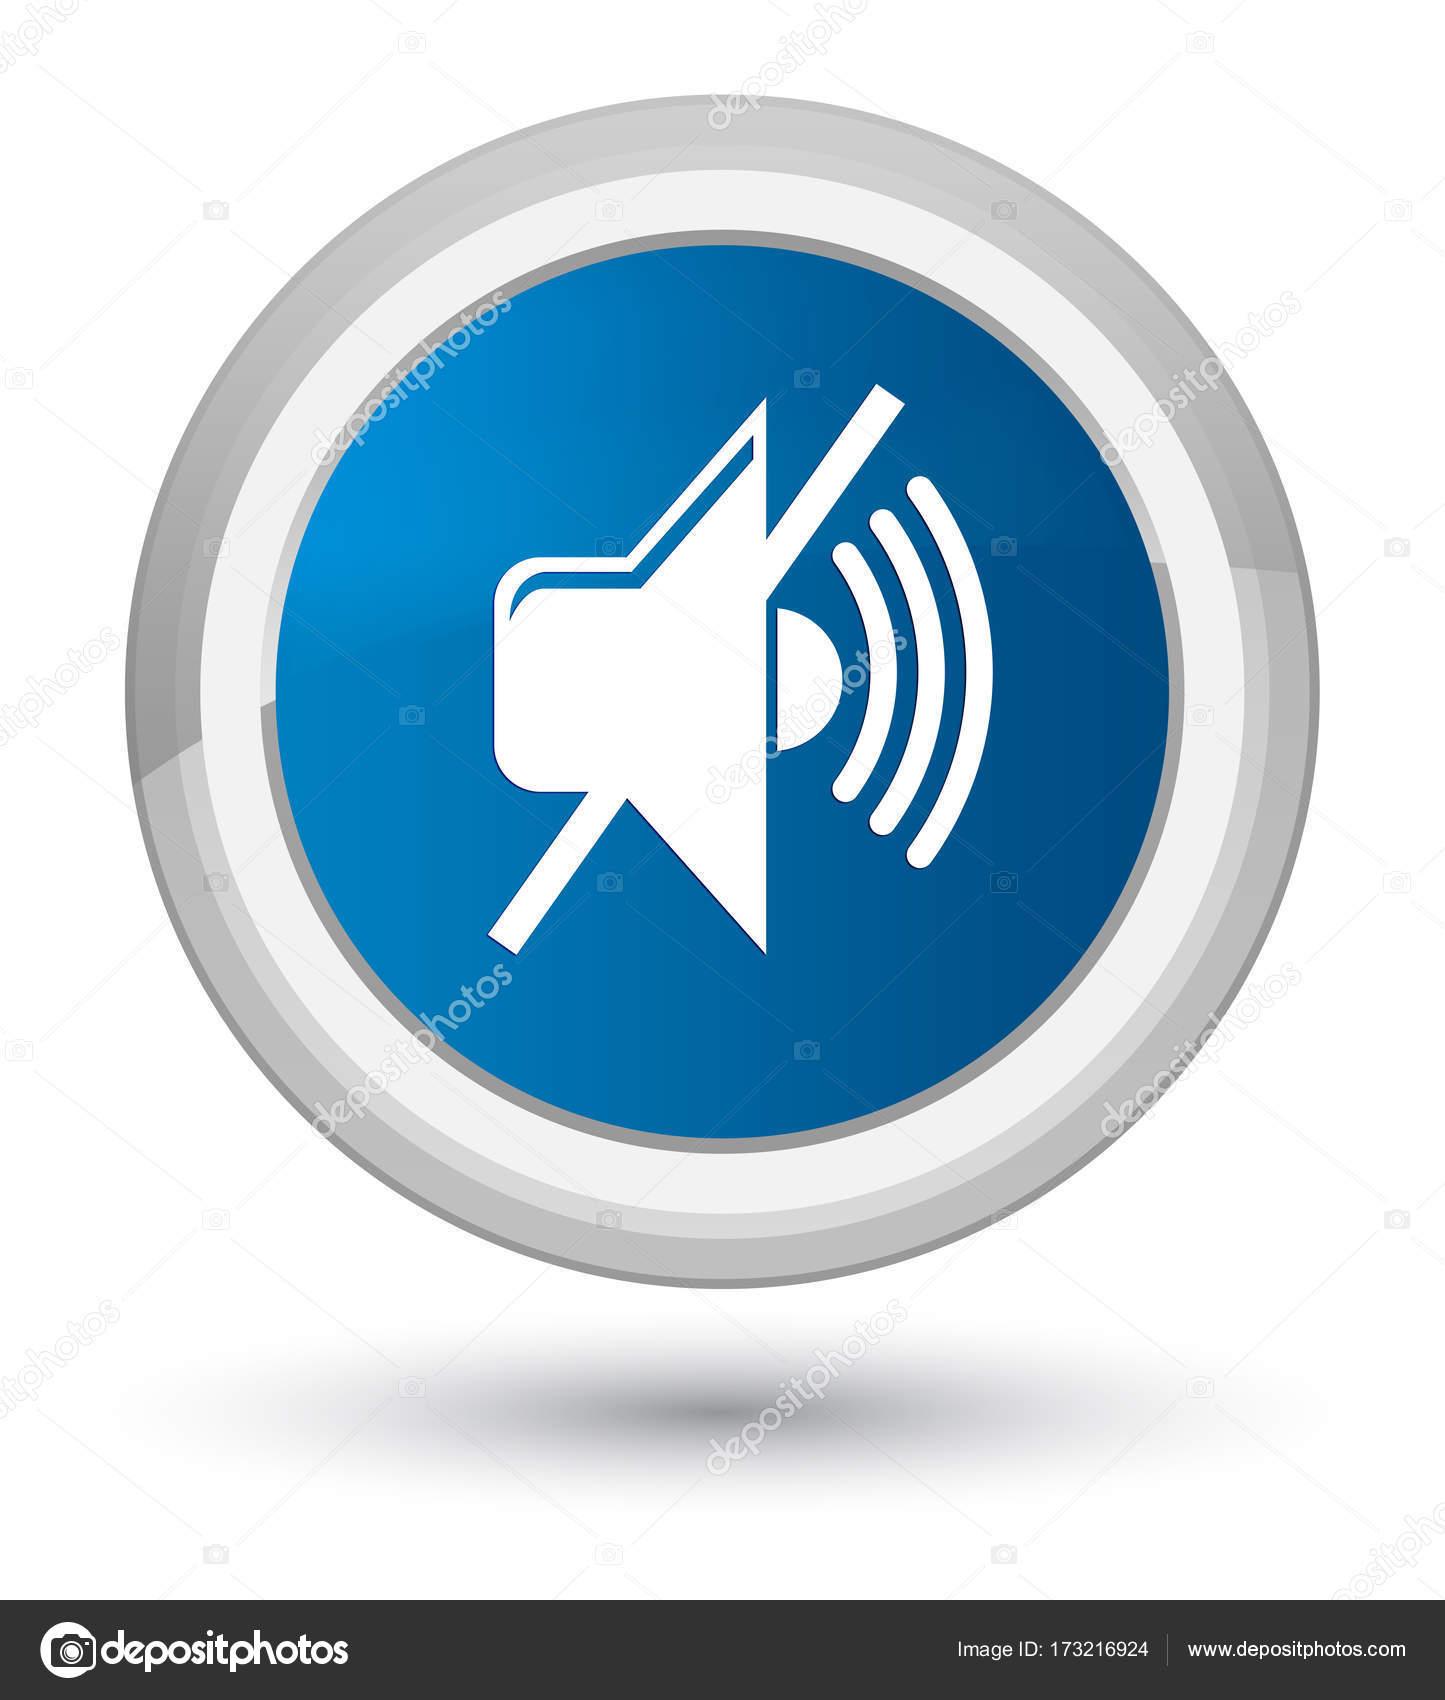 Phone Mute Icon Round Wiring Diagrams 220v3gozonegeneratorozonetubecircuitboard3ghrforwaterplant Volume Prime Blue Button Stock Photo Fr Design Rh Depositphotos Com Email